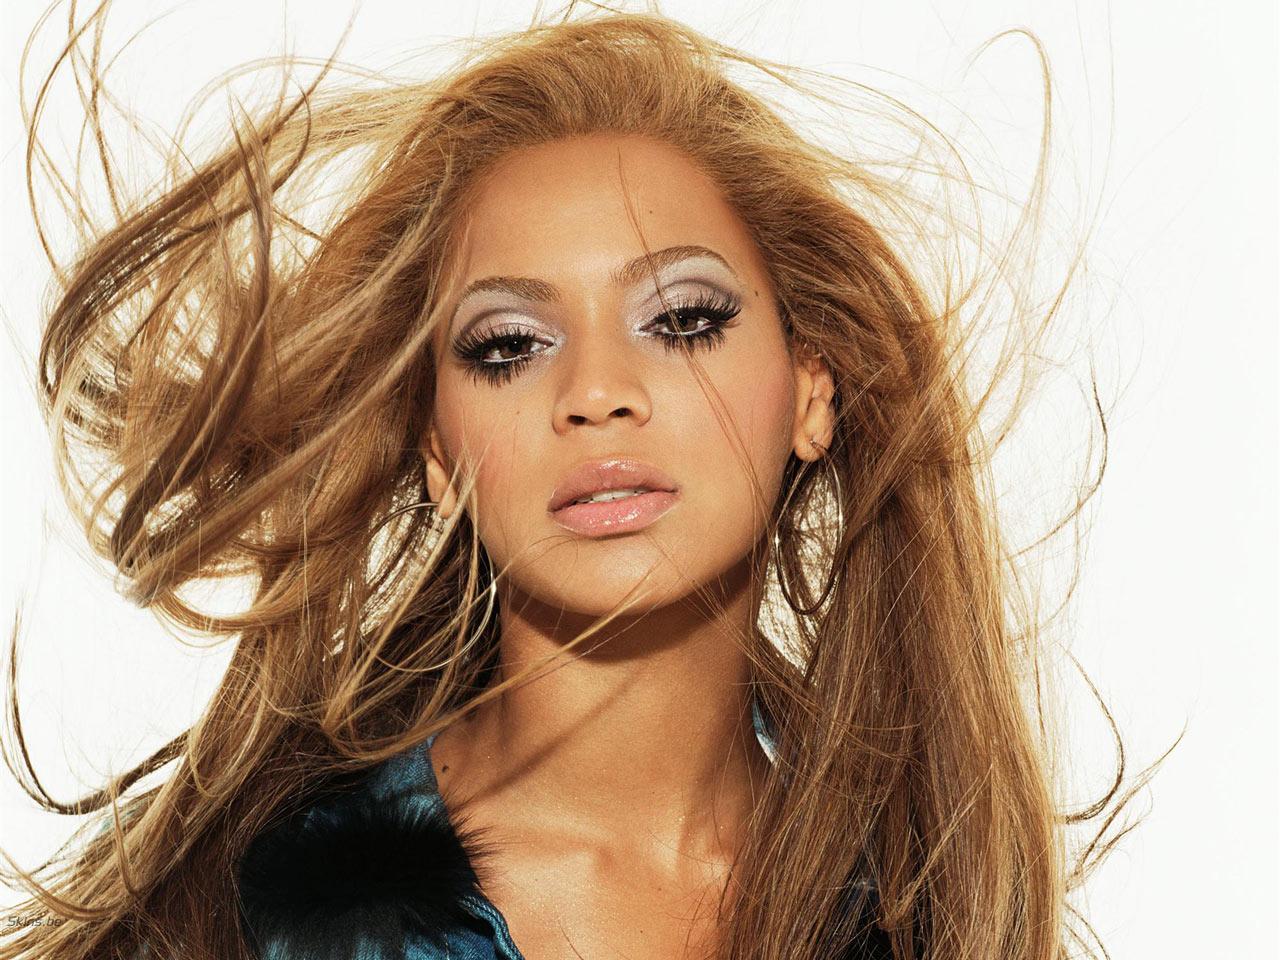 http://1.bp.blogspot.com/-ypp9Op0-aQA/UH9IAzGOW5I/AAAAAAAABwk/AhPeaFRkoBI/s1600/Beyonce+Knowles+pic.jpg